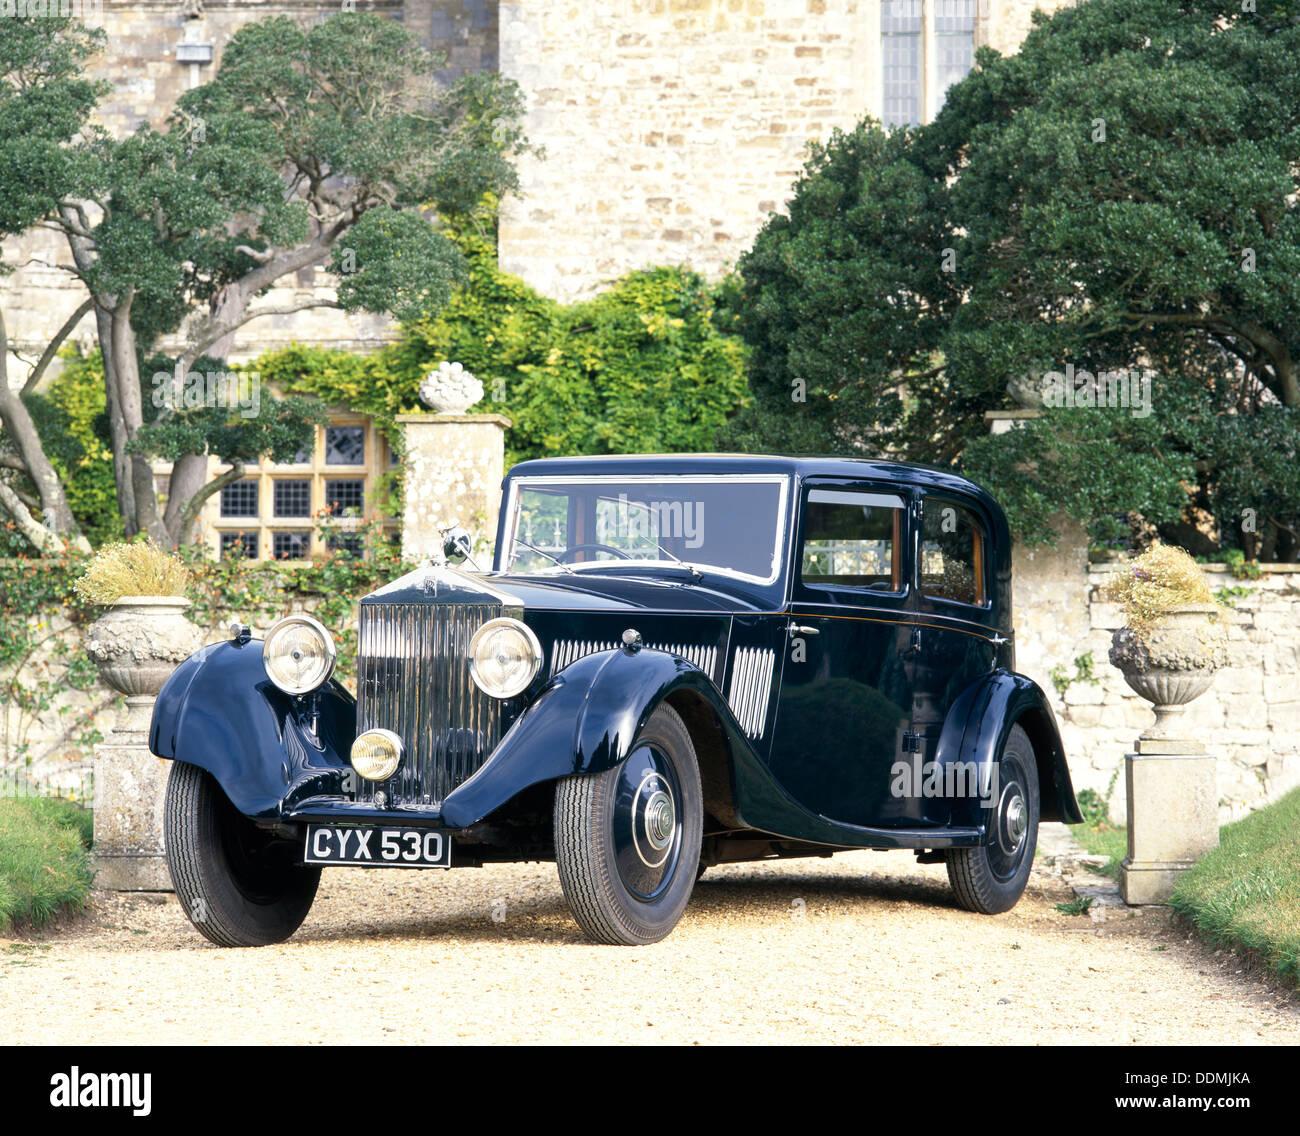 A 1935 Rolls-Royce 20/25. - Stock Image